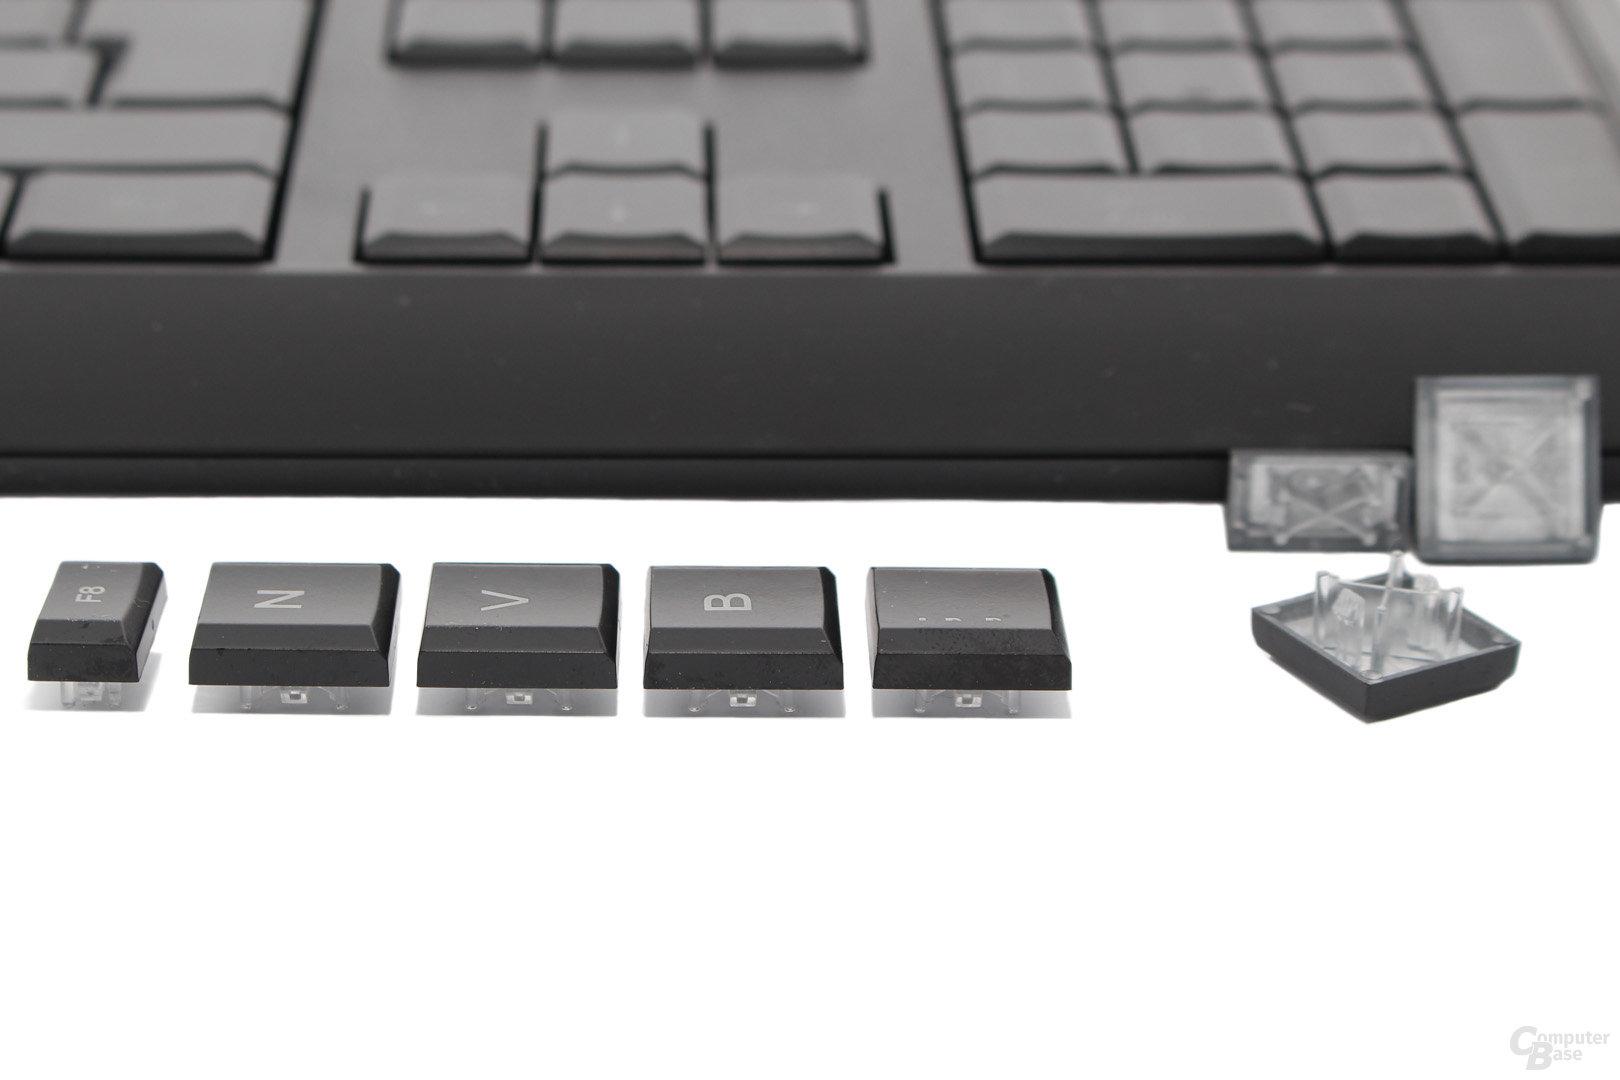 Flache Tastenkappen aus ABS-Kunststoff